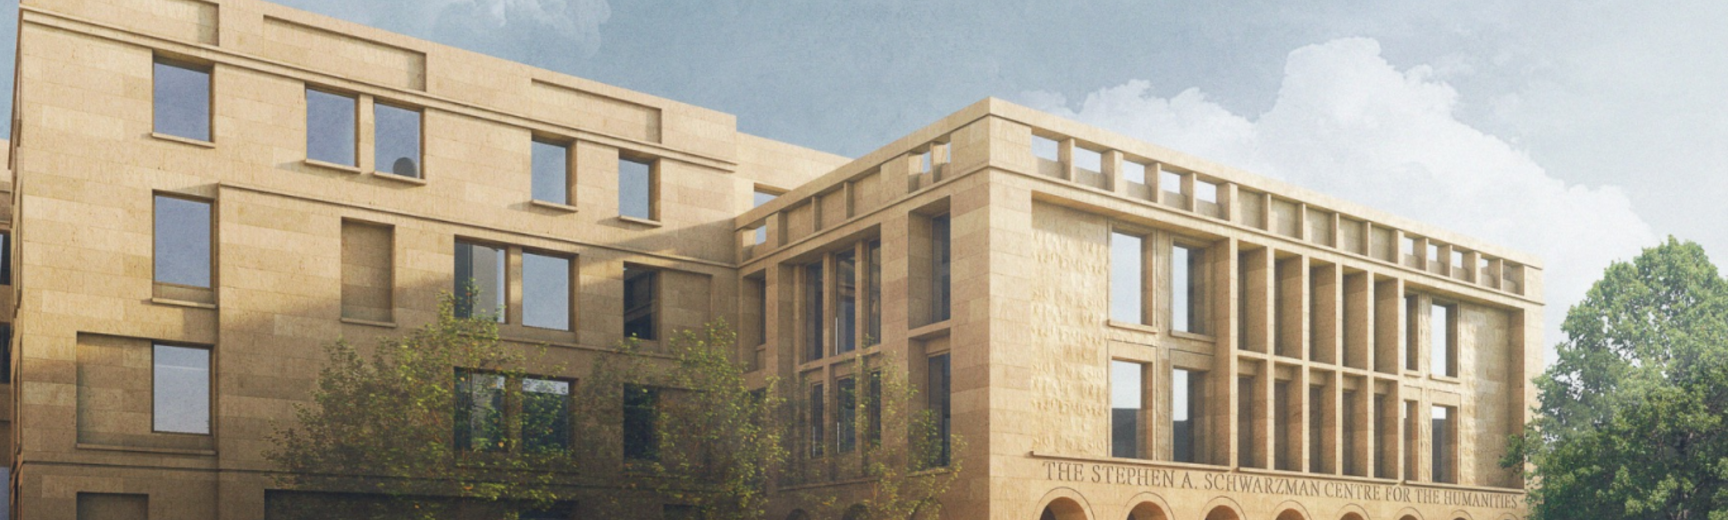 Illustration of new Schwarzman Centre